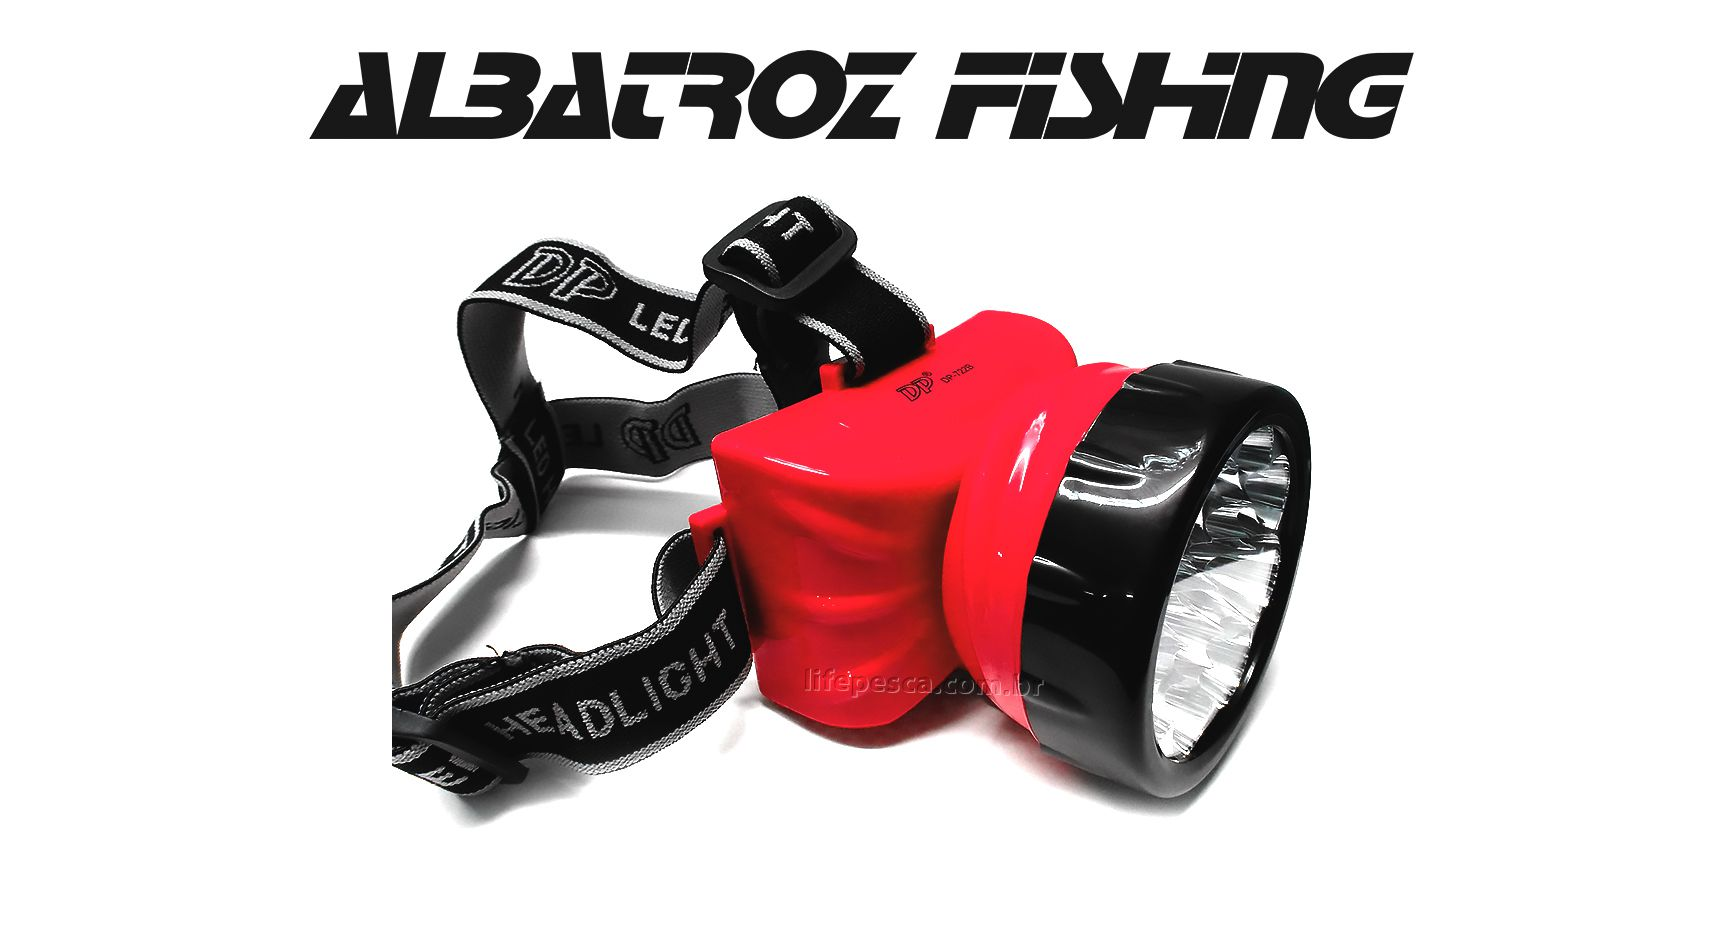 Lanterna Led Para Cabeça Recarregável - Albatroz Fishing - LED-722A